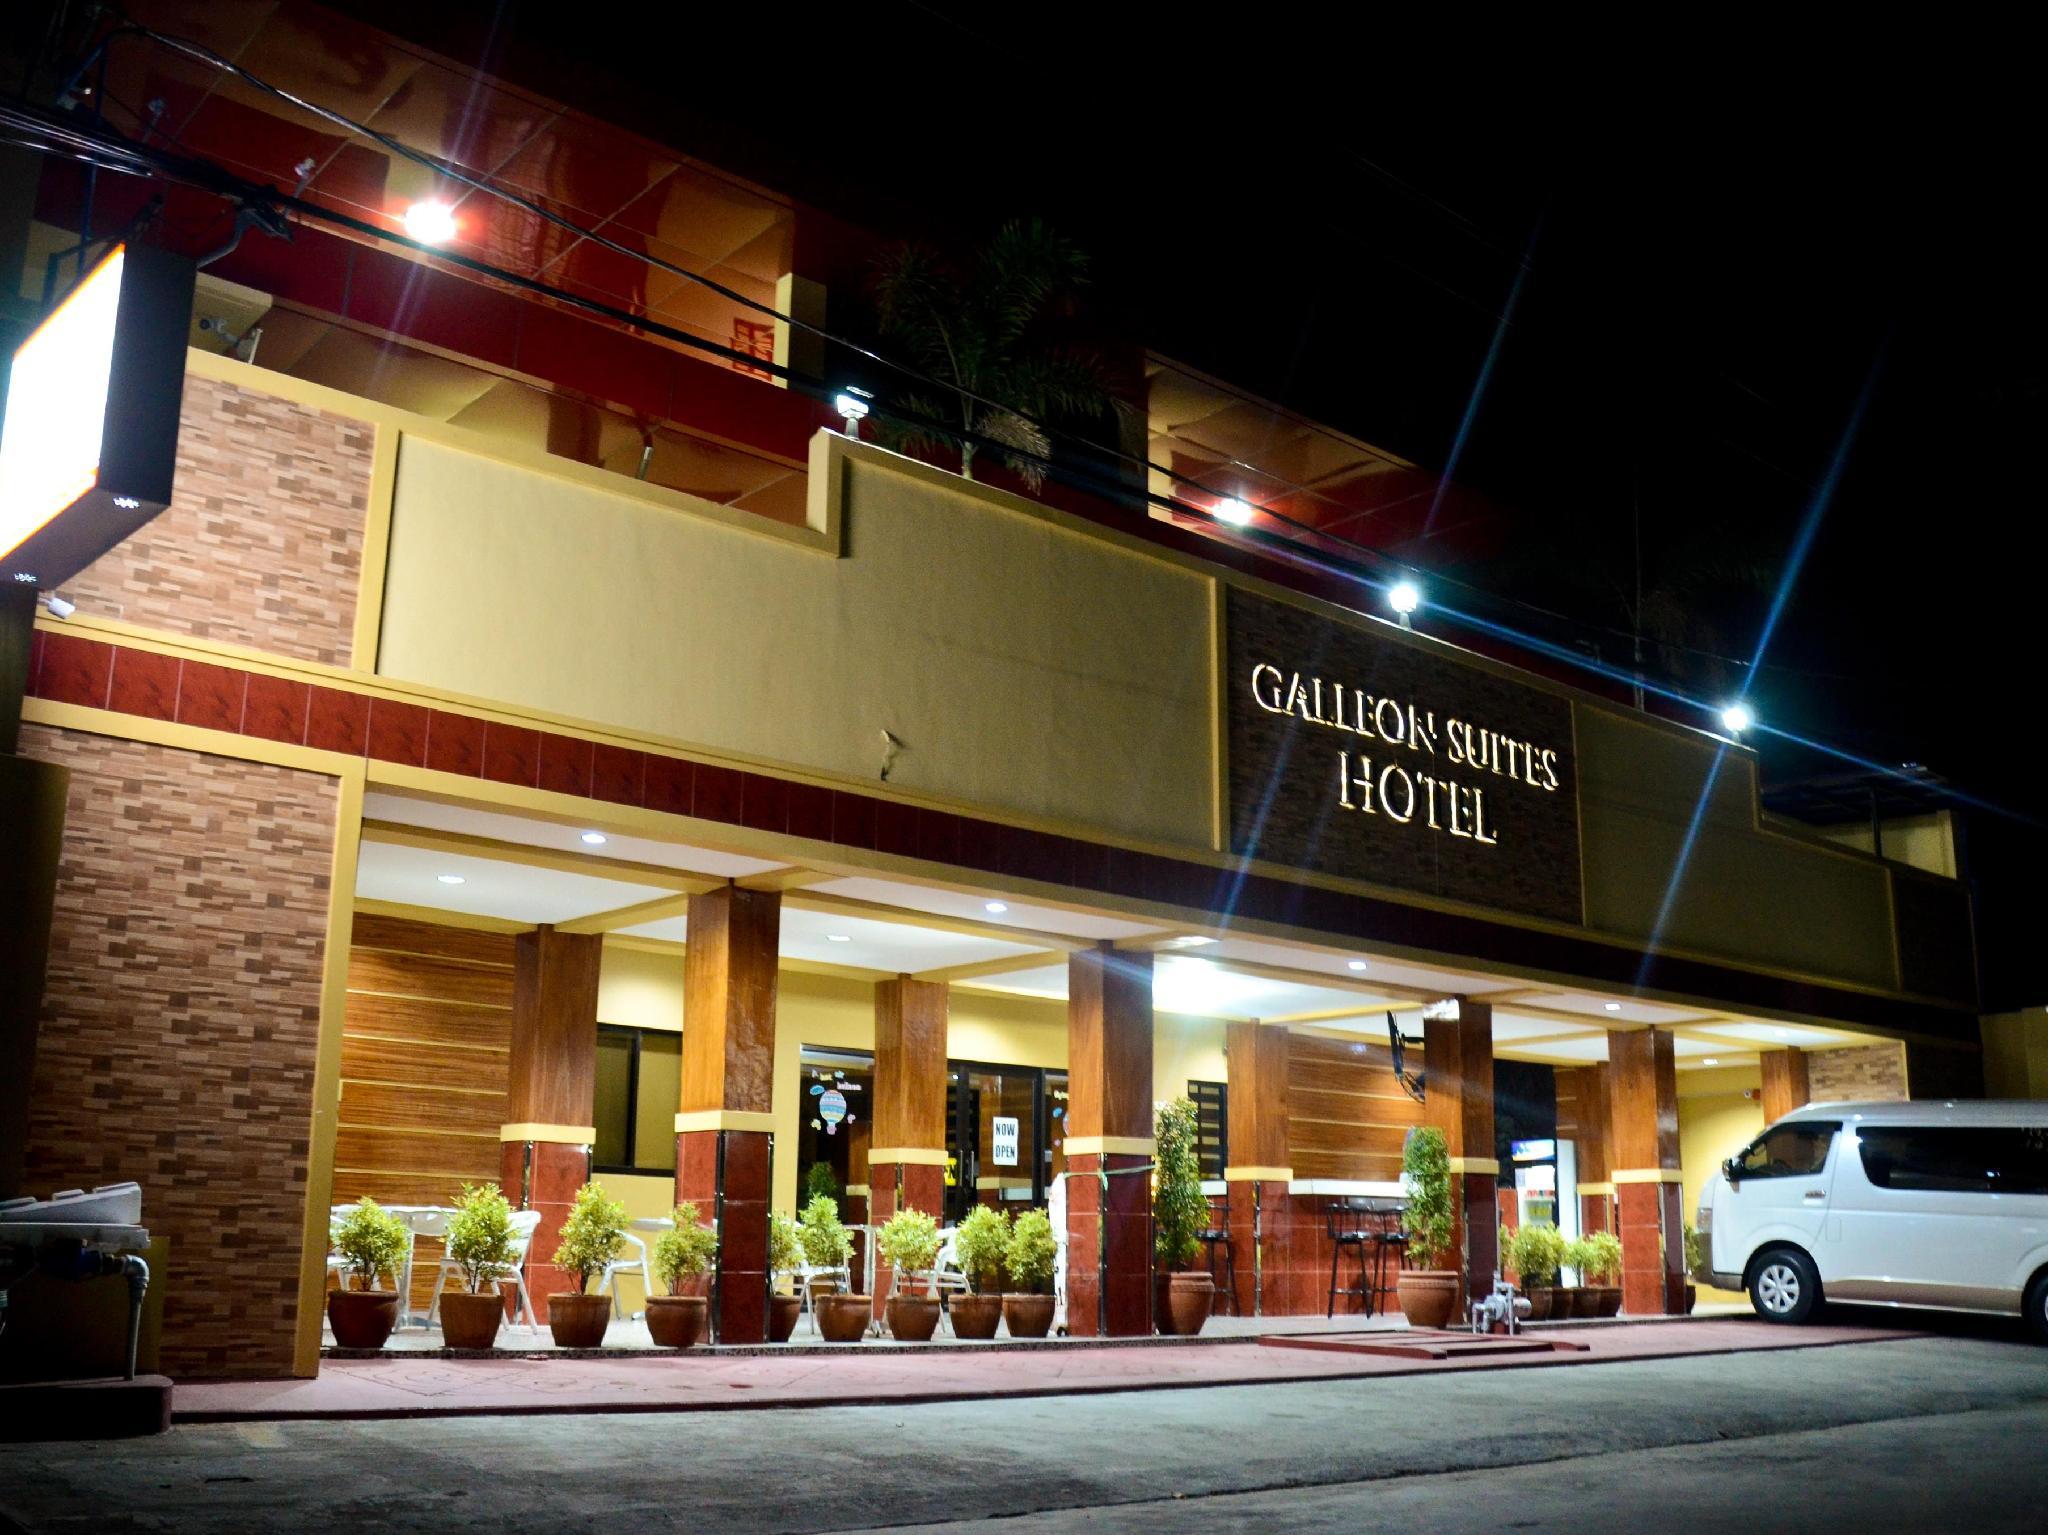 La Galleon Suites Hotel